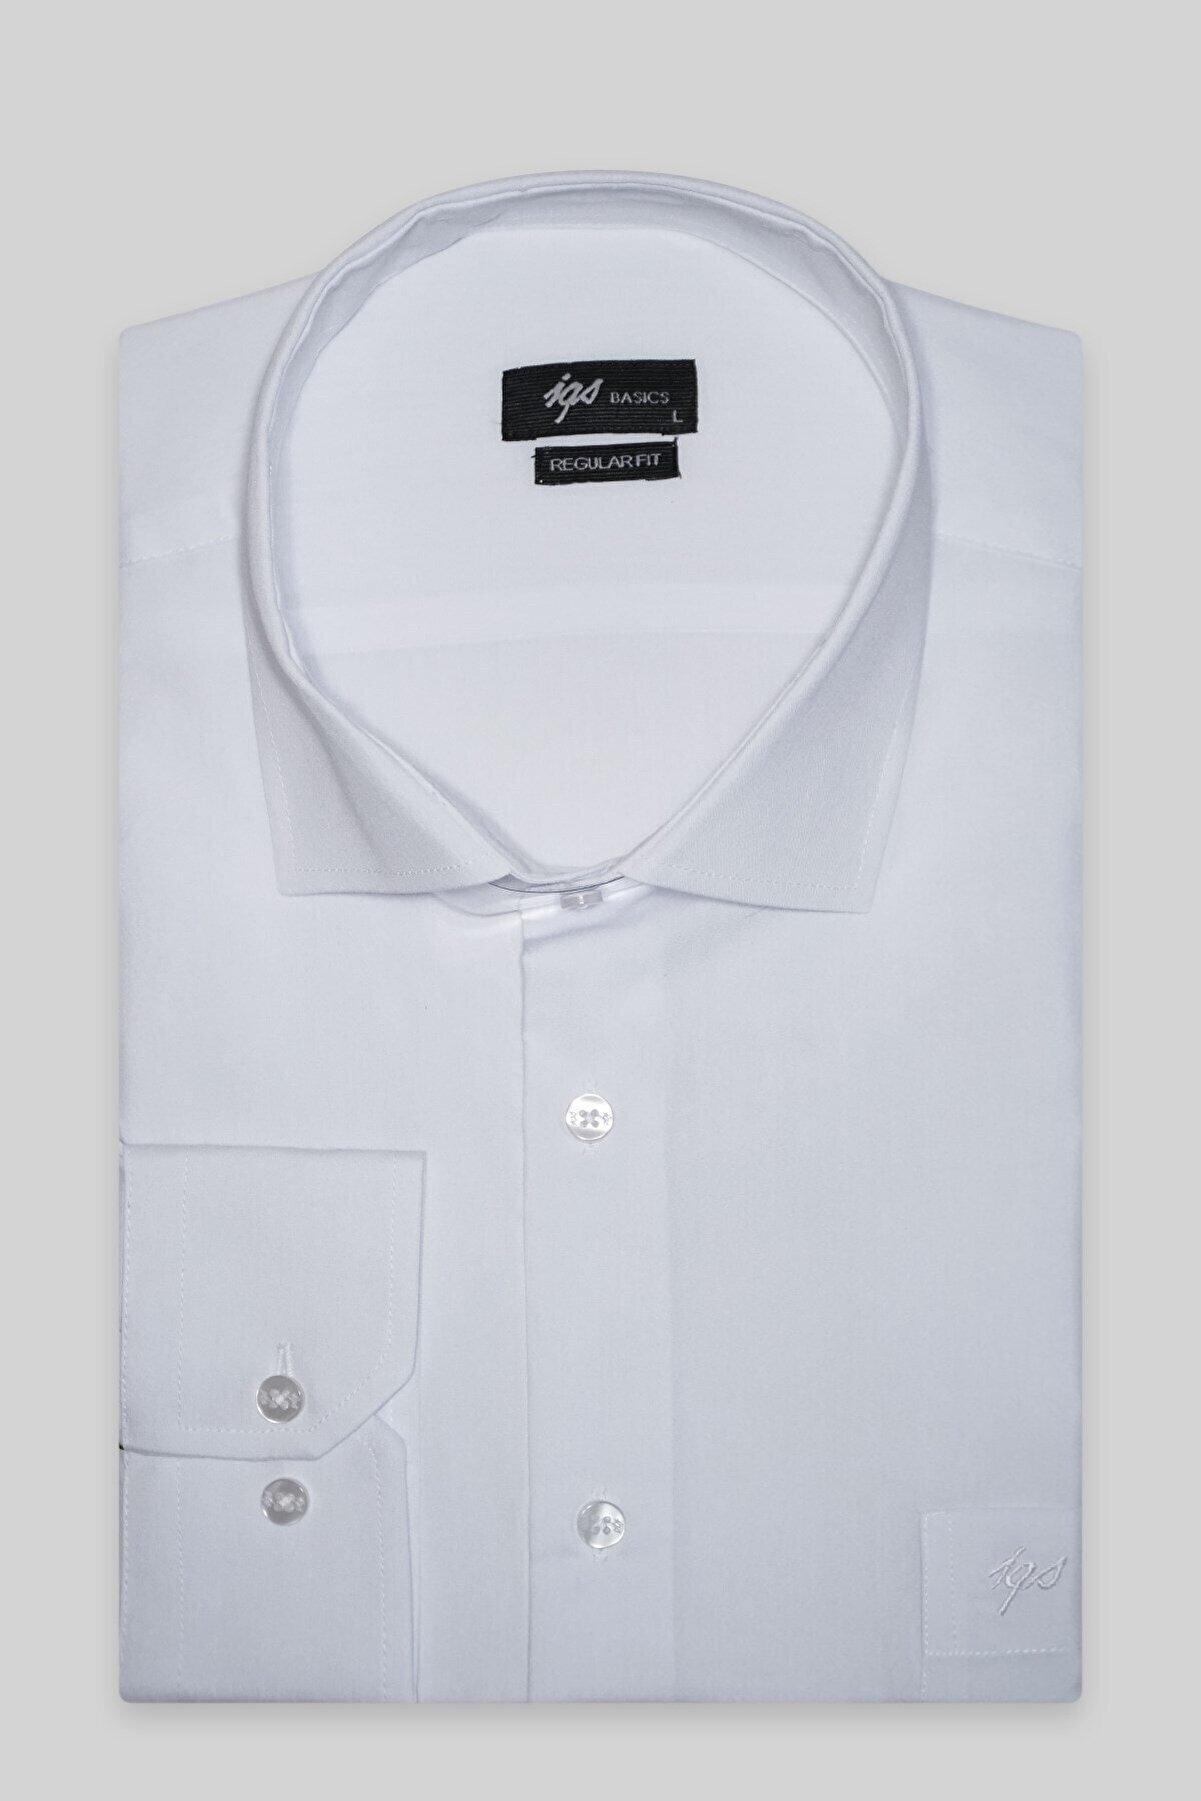 İgs Erkek Beyaz Regularfıt  Rahat Kalıp  Klasik Gömlek